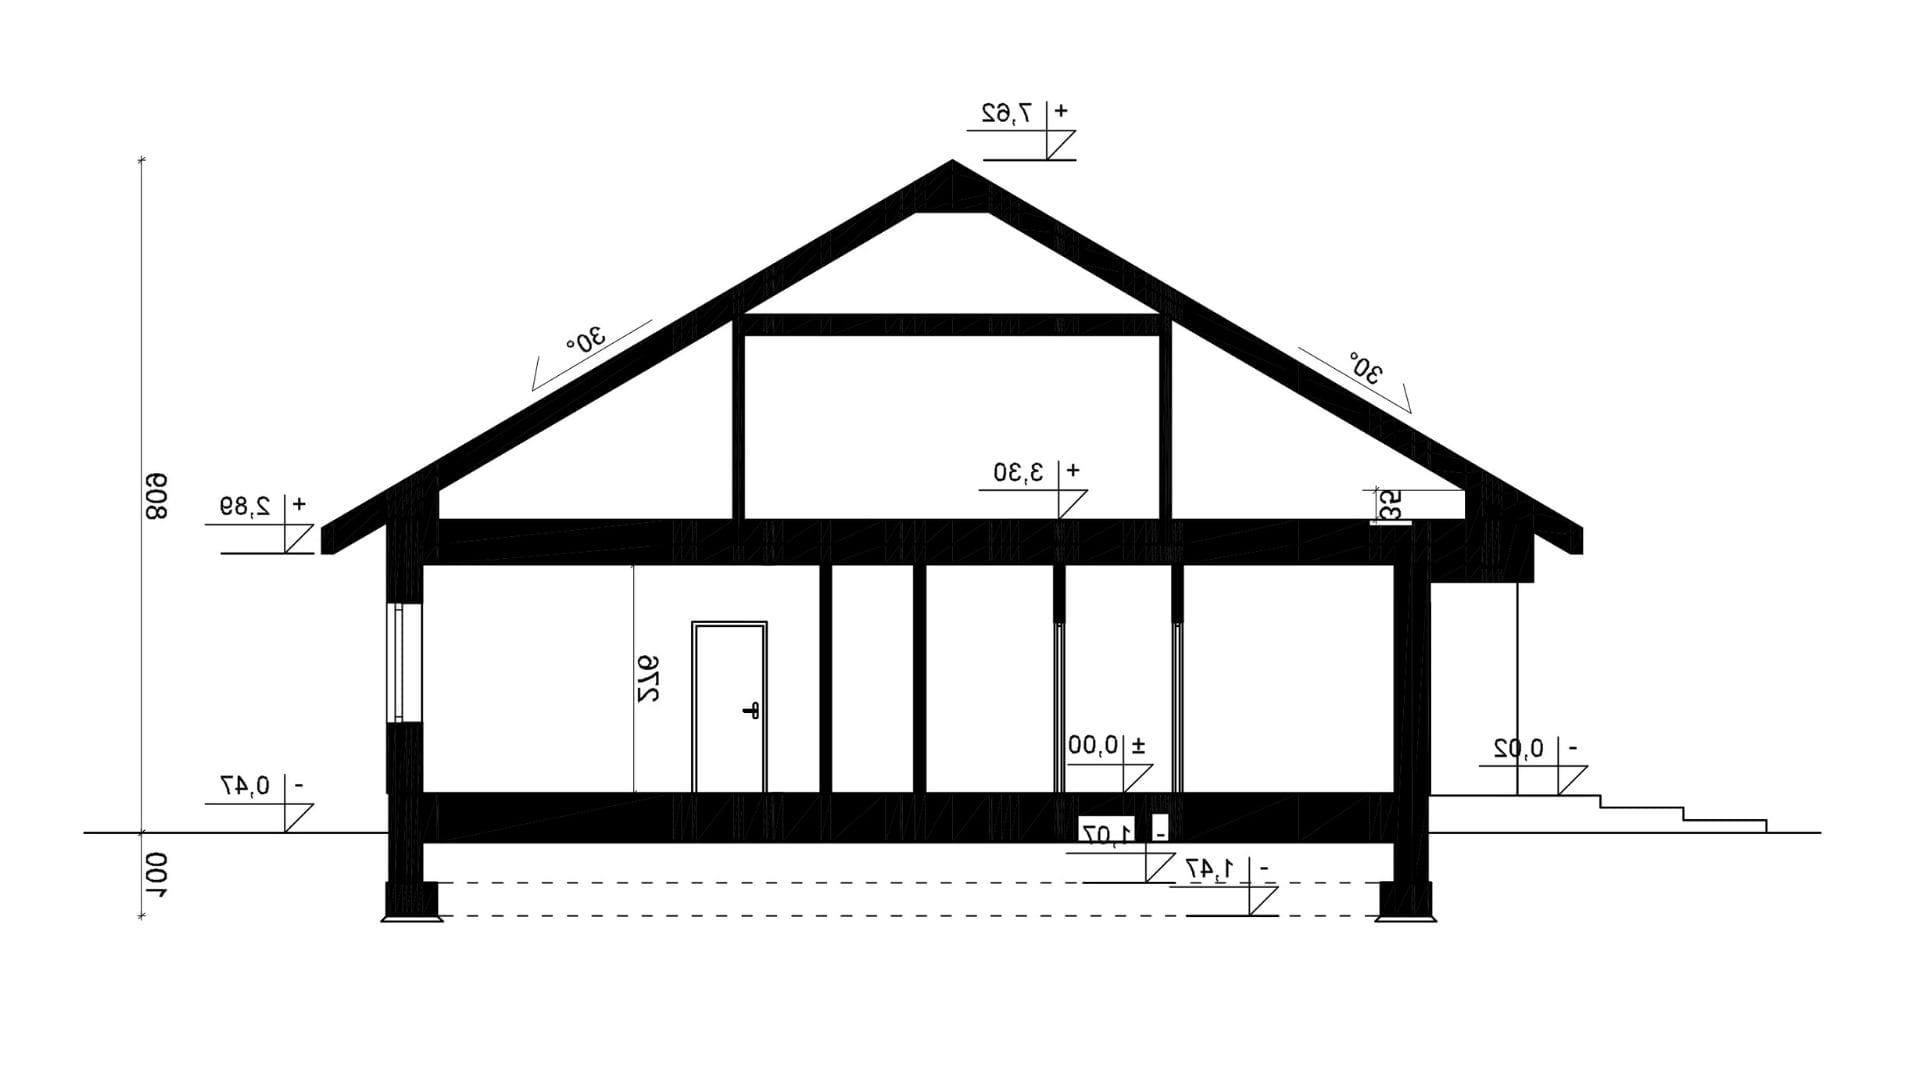 Przekrój A-A - projekt domu SEJ-PRO 071 ENERGO - odbicie lustrzane